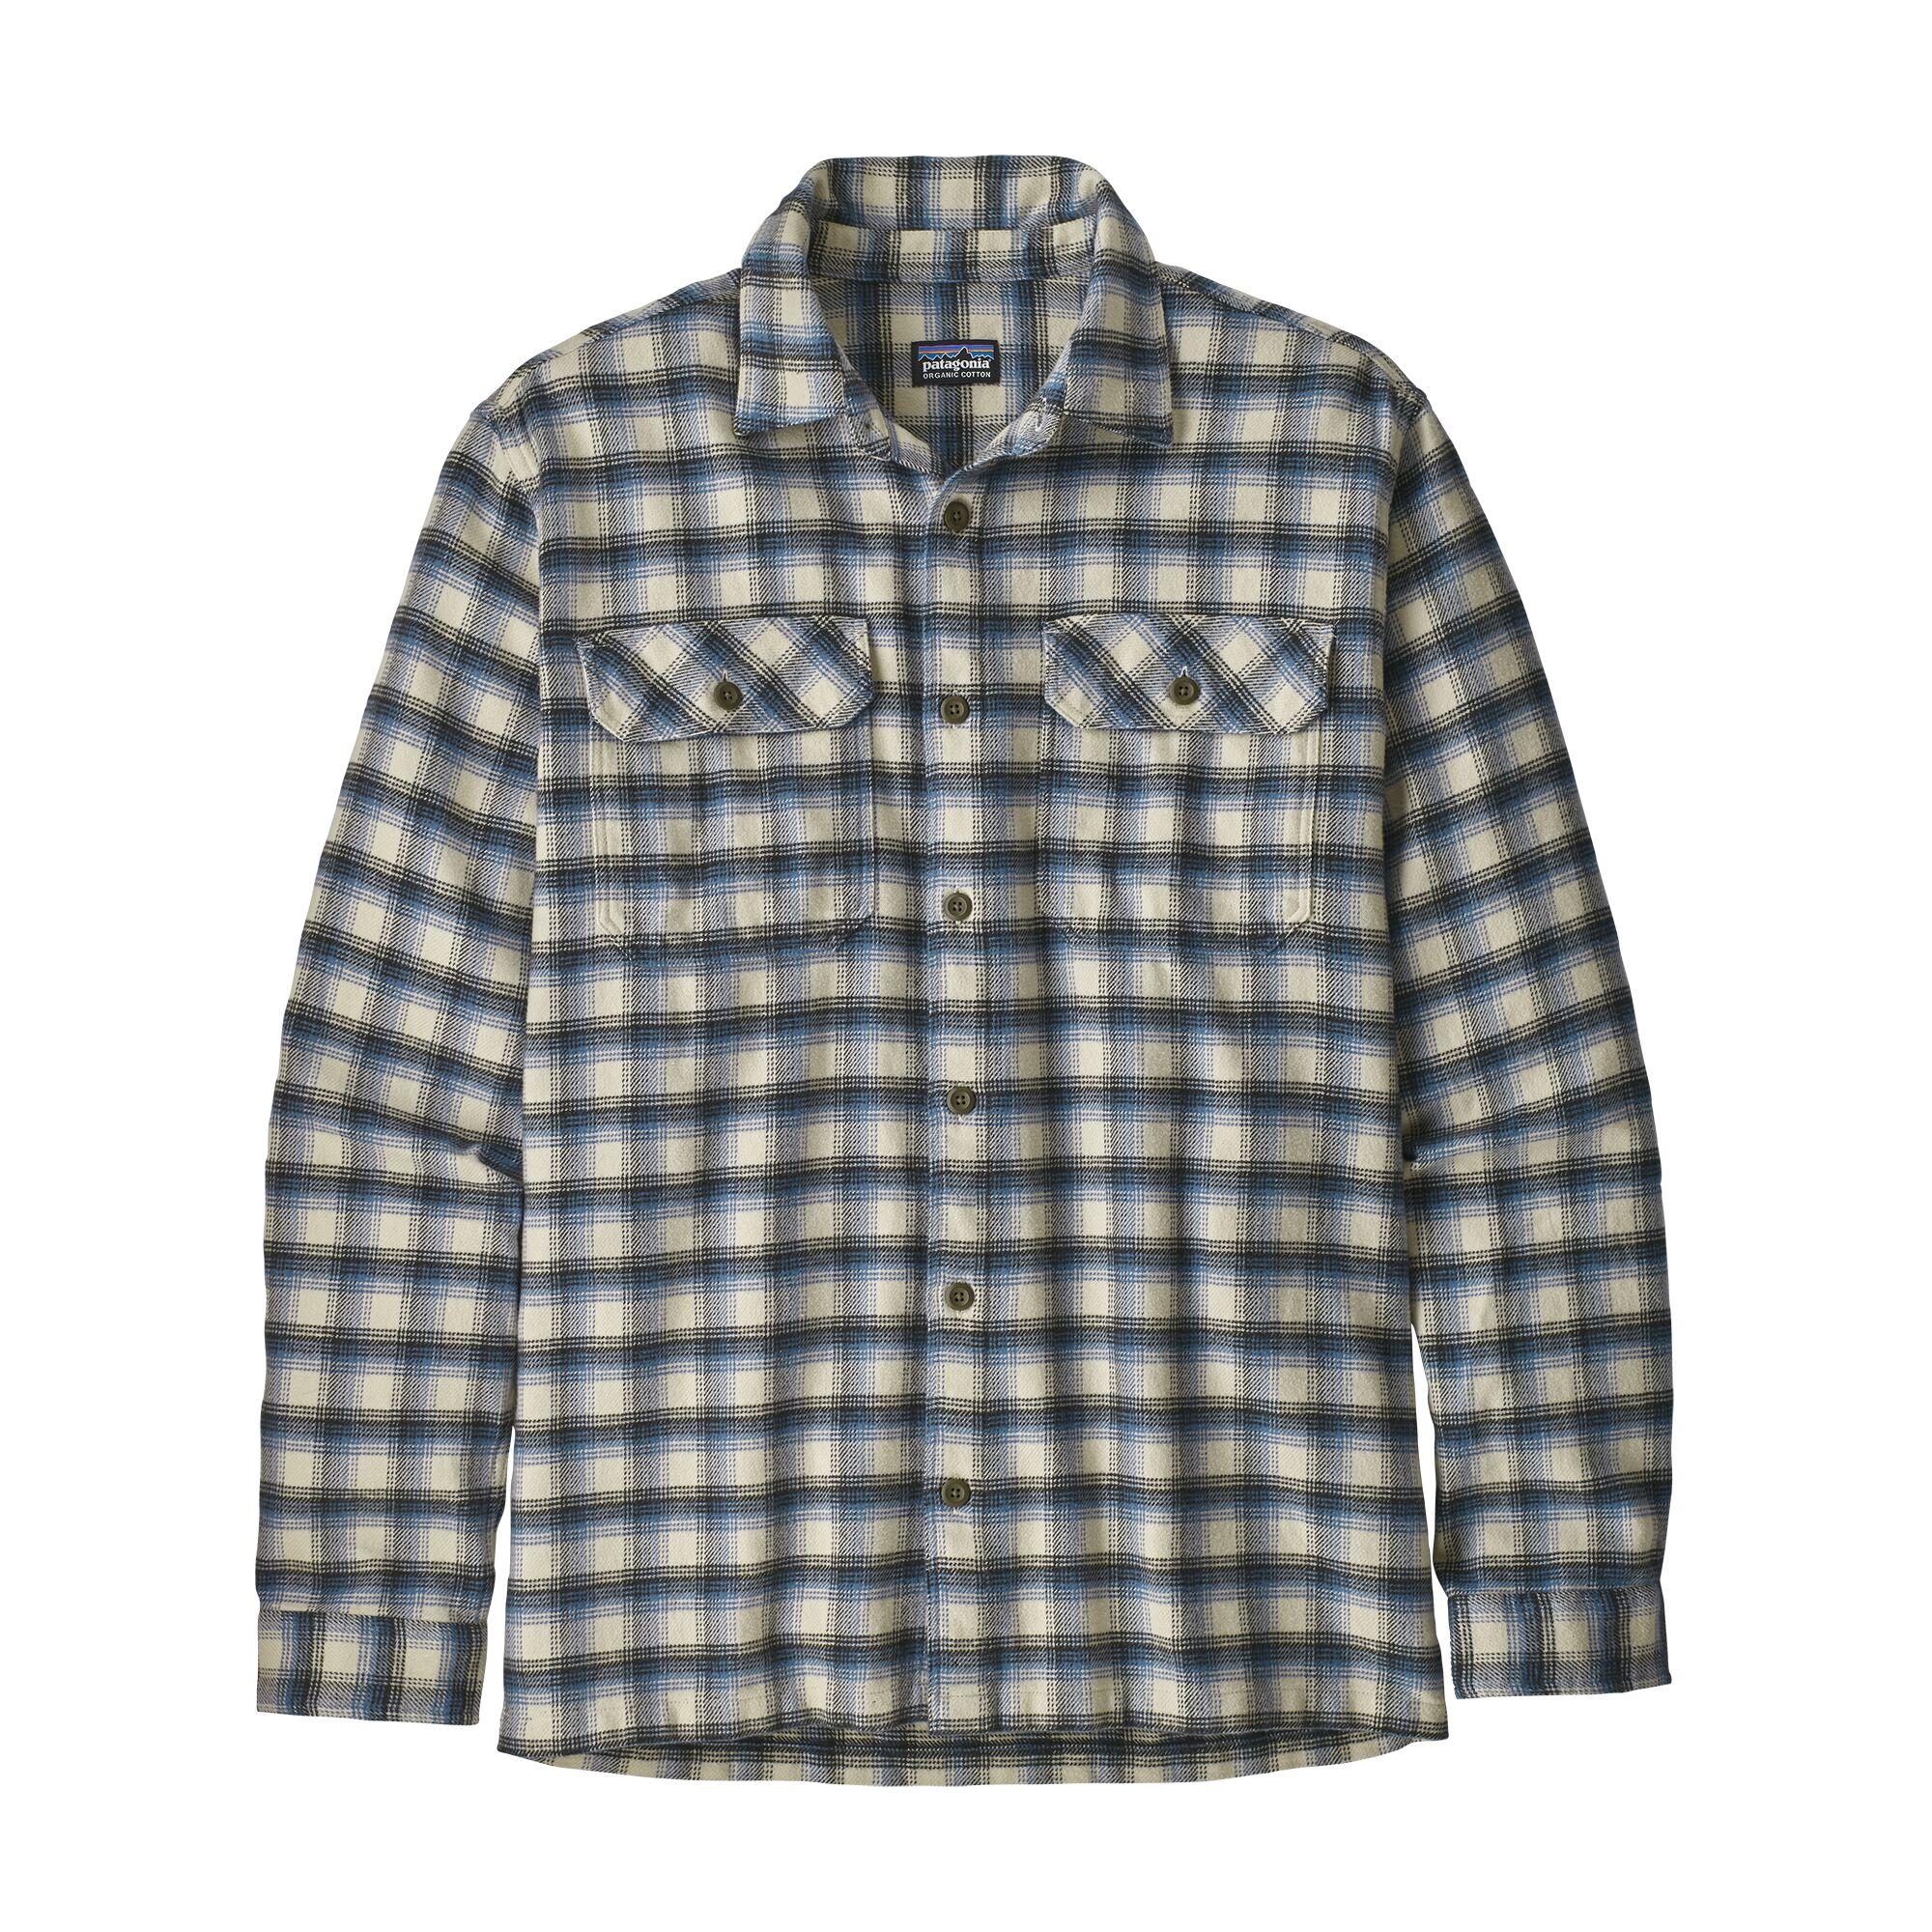 Patagonia Fjord Flannel Shirt, M's